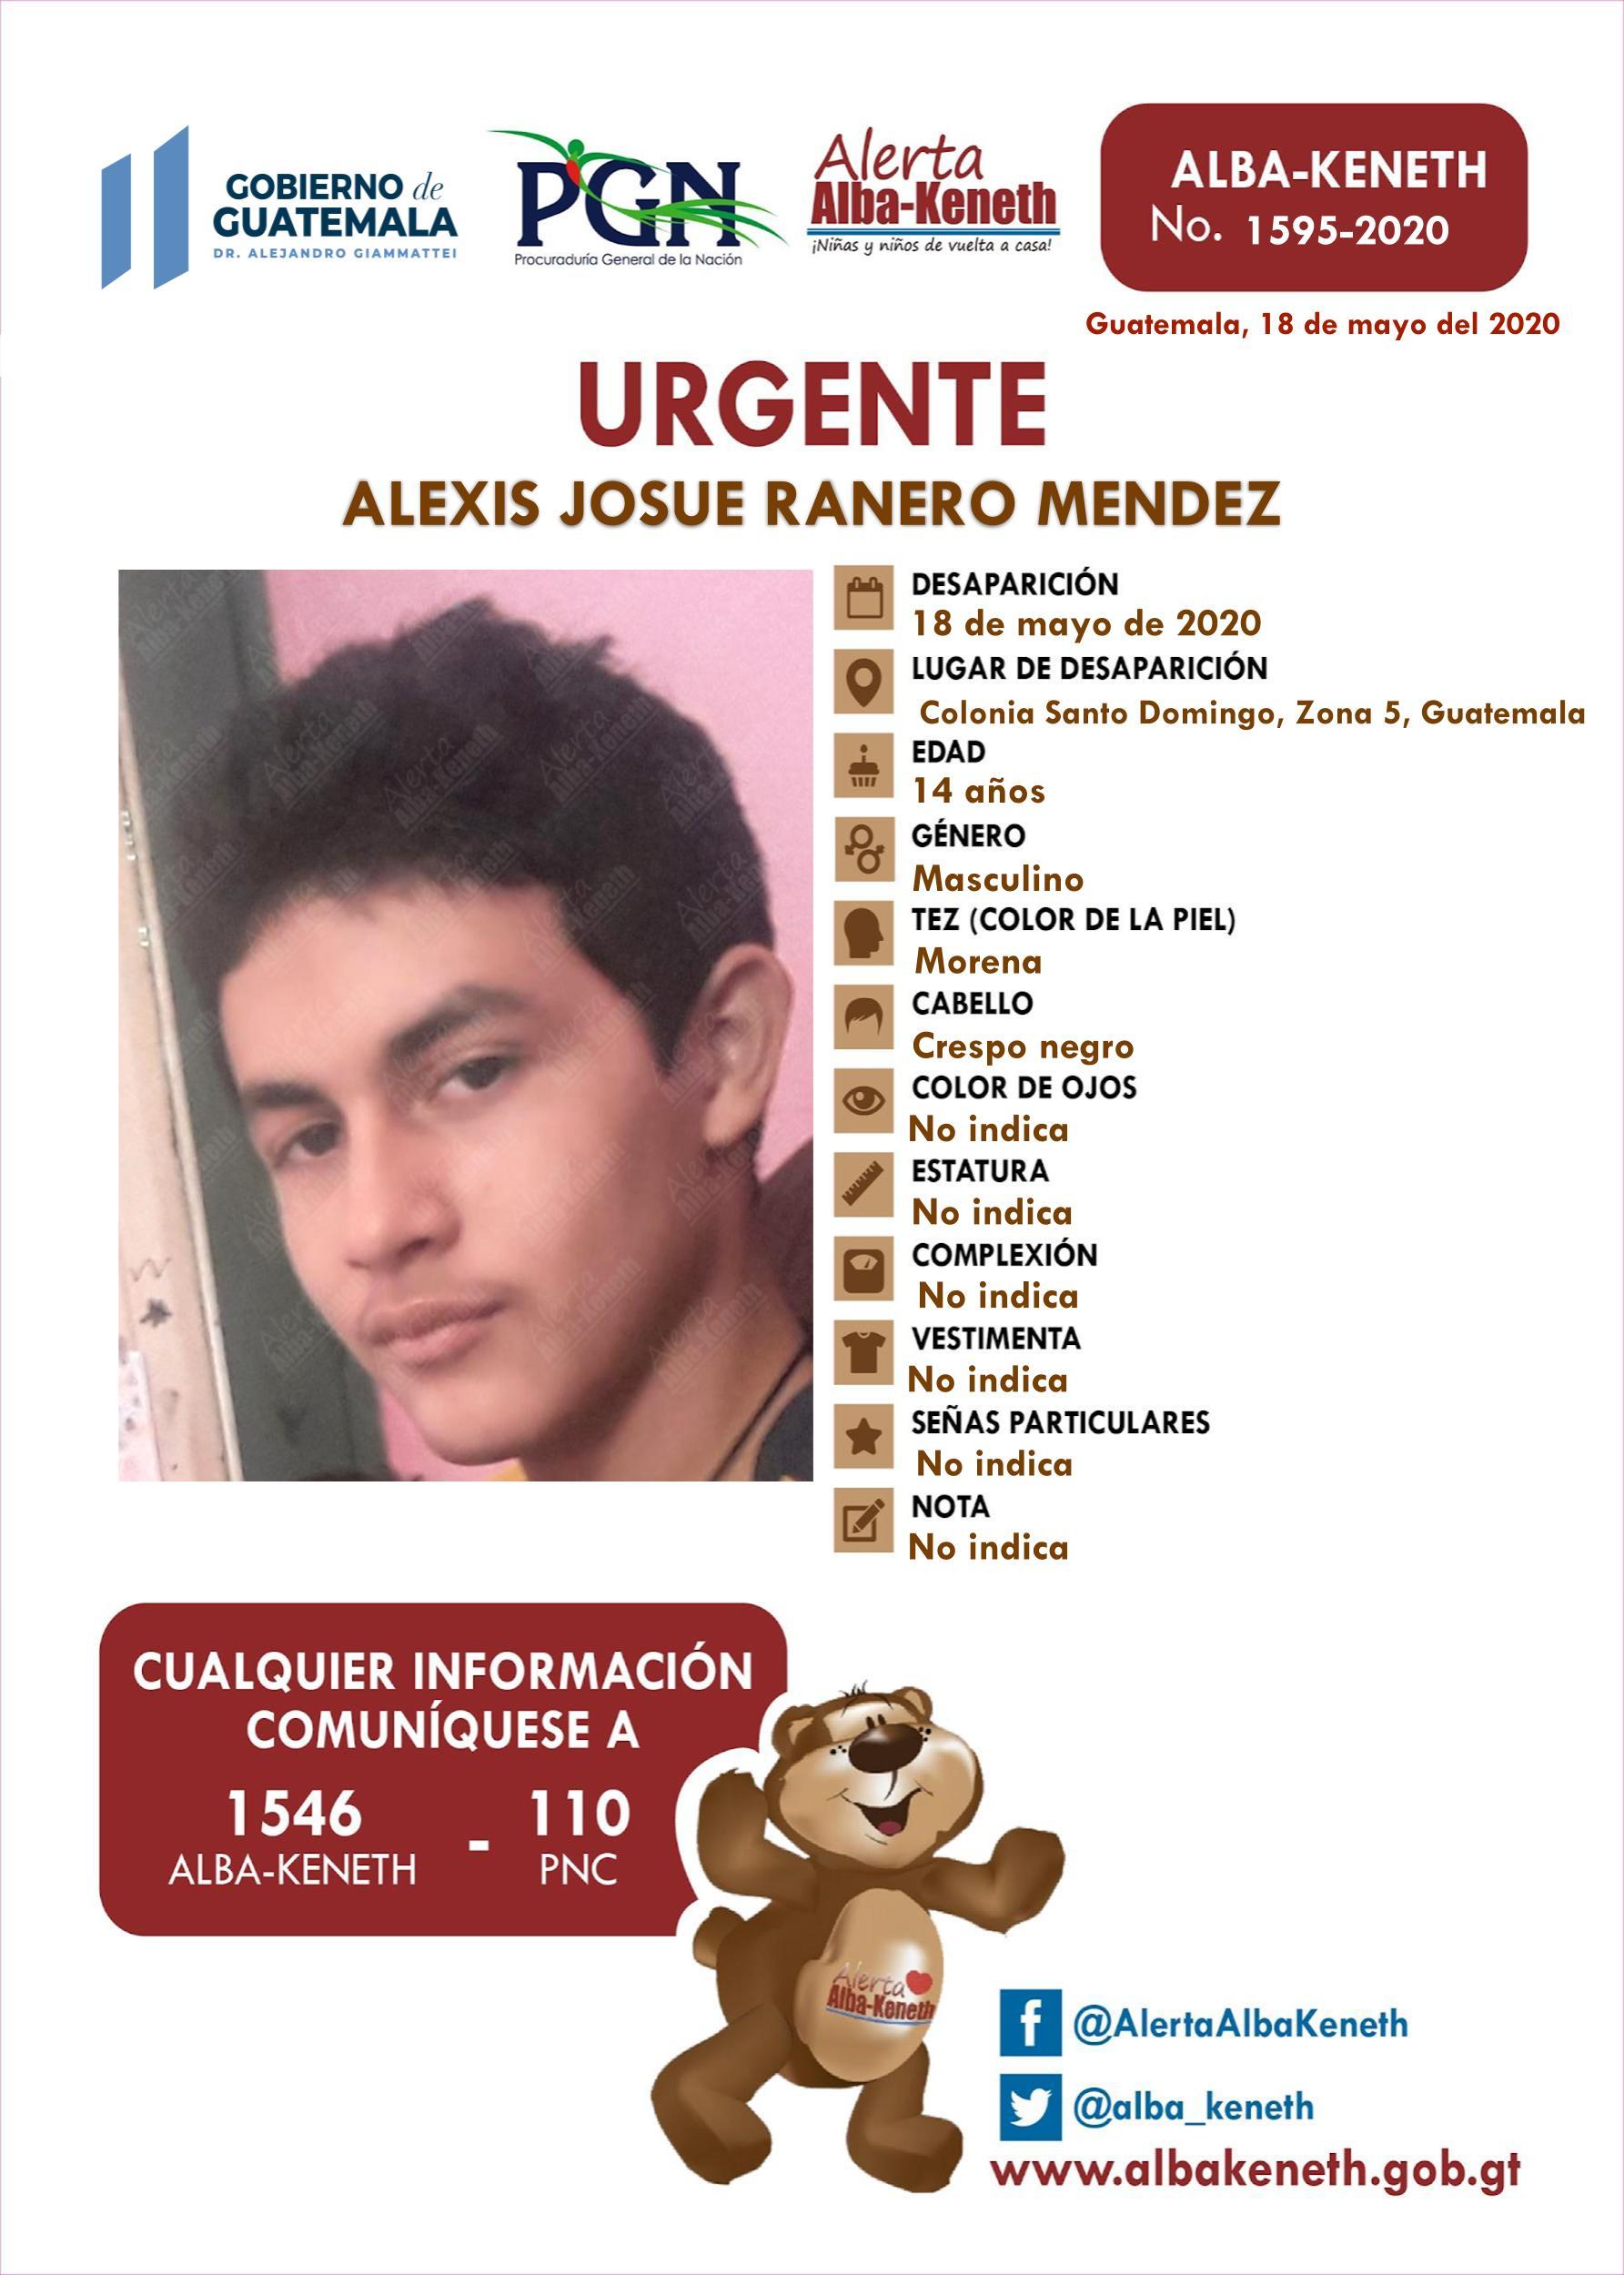 Alexis Josue Ranero Mendez